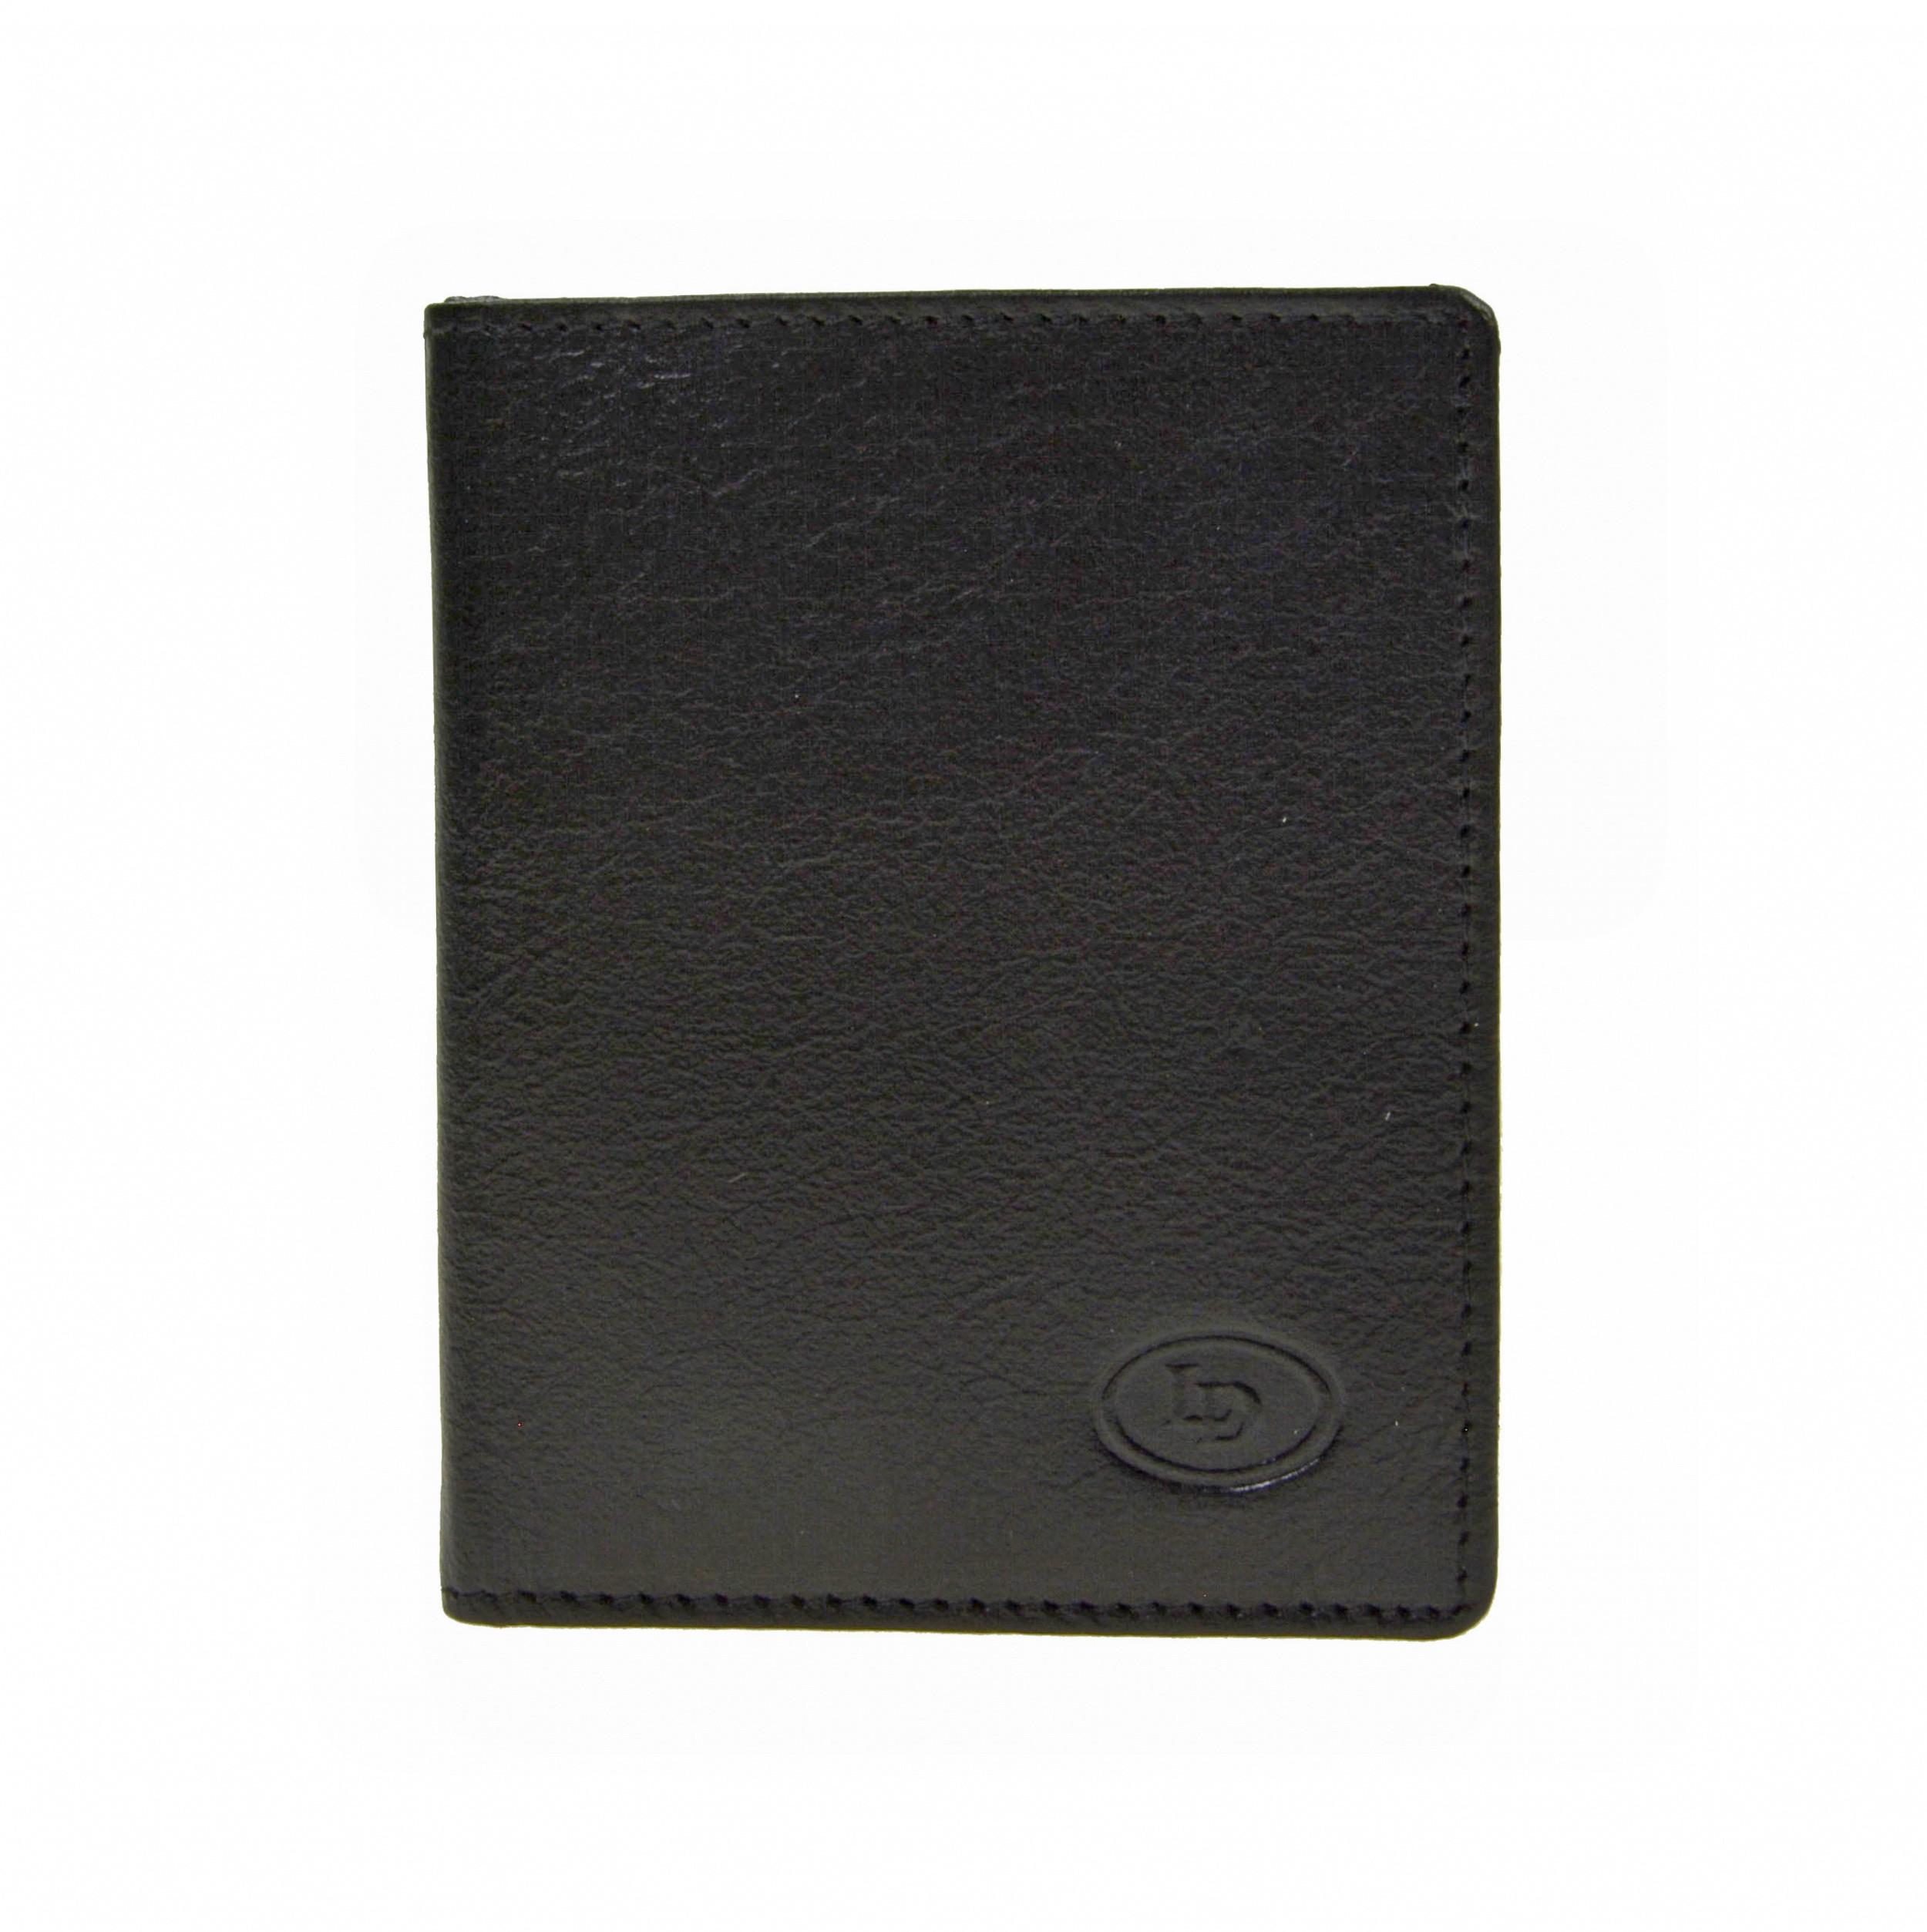 Leather Design Creditcard etui KA 1119 Zwart